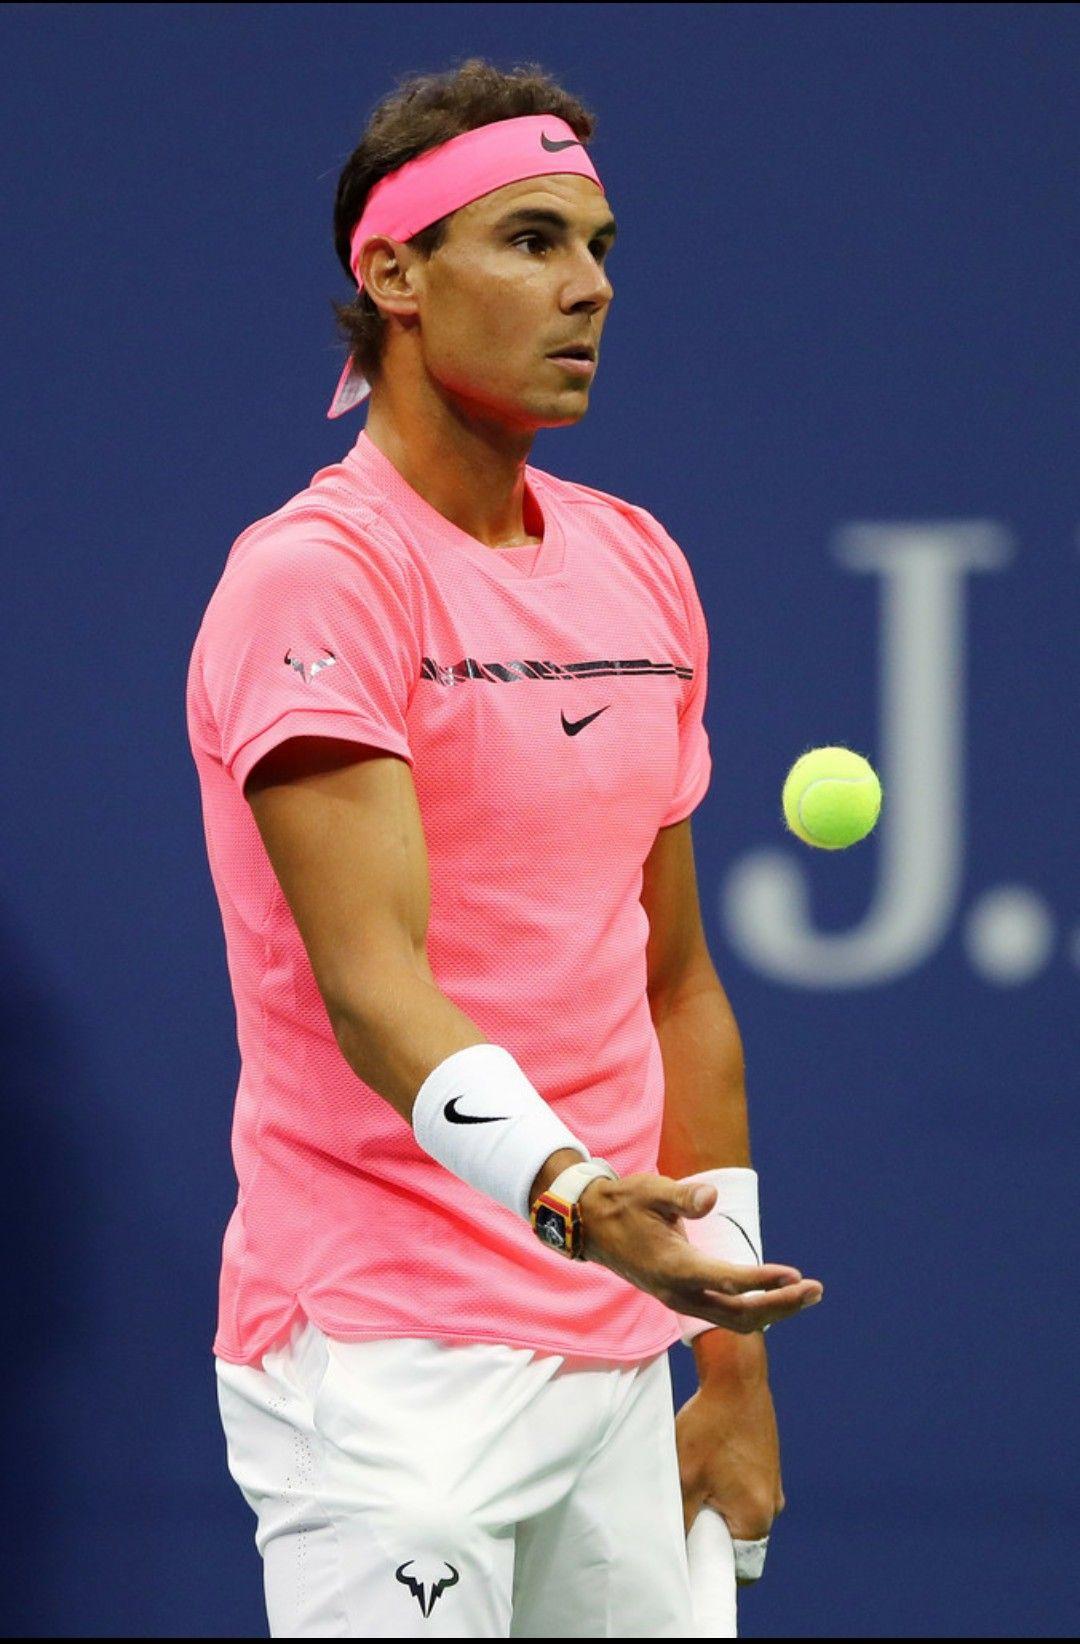 Rafa Nadal Us Open 2017 Rafael Nadal Tennis Photos Tennis Champion